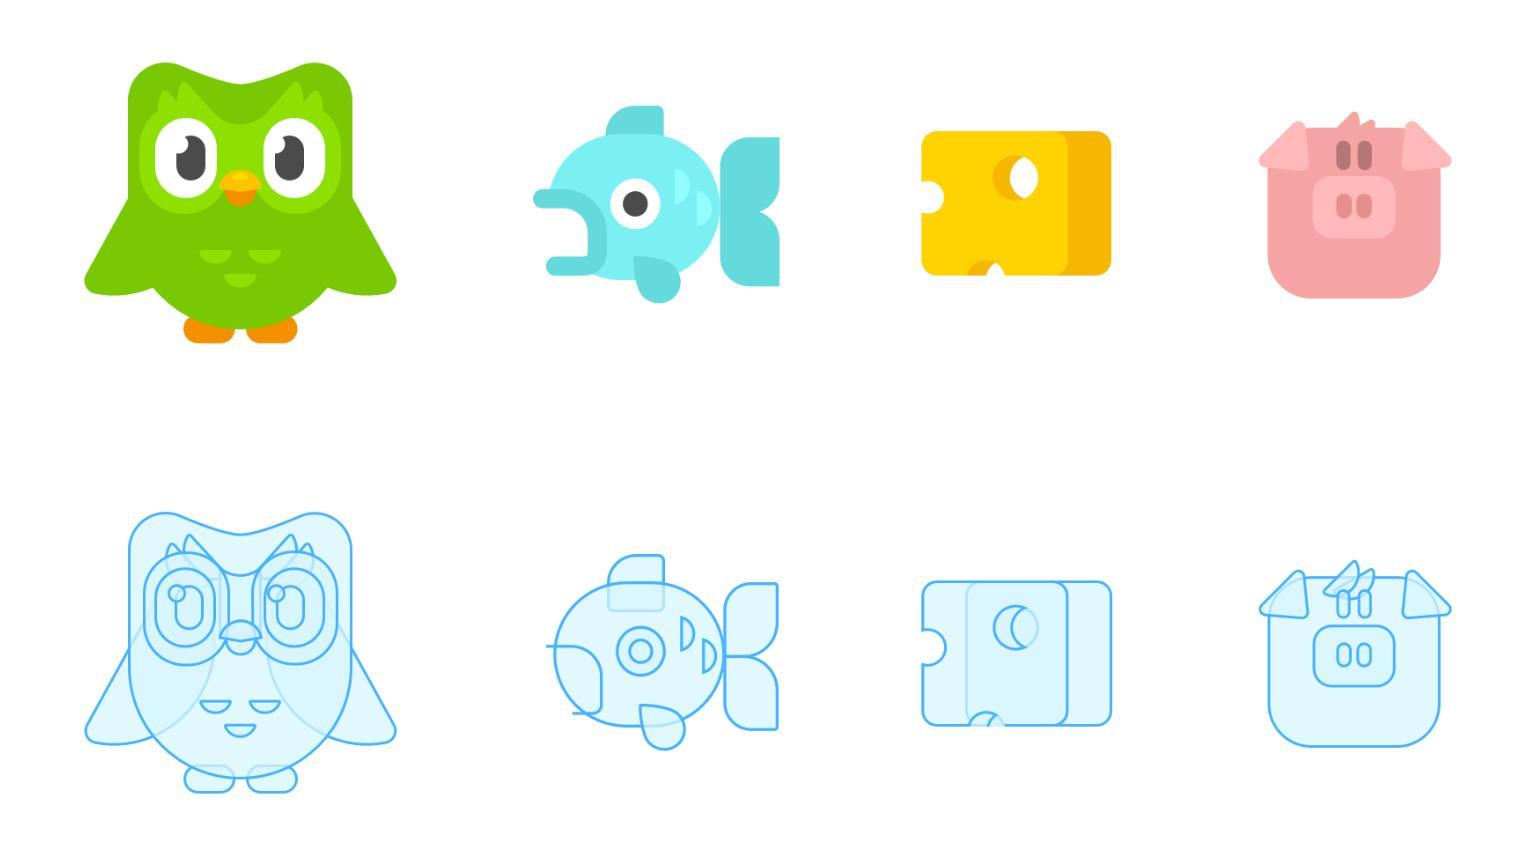 Duolingo icons